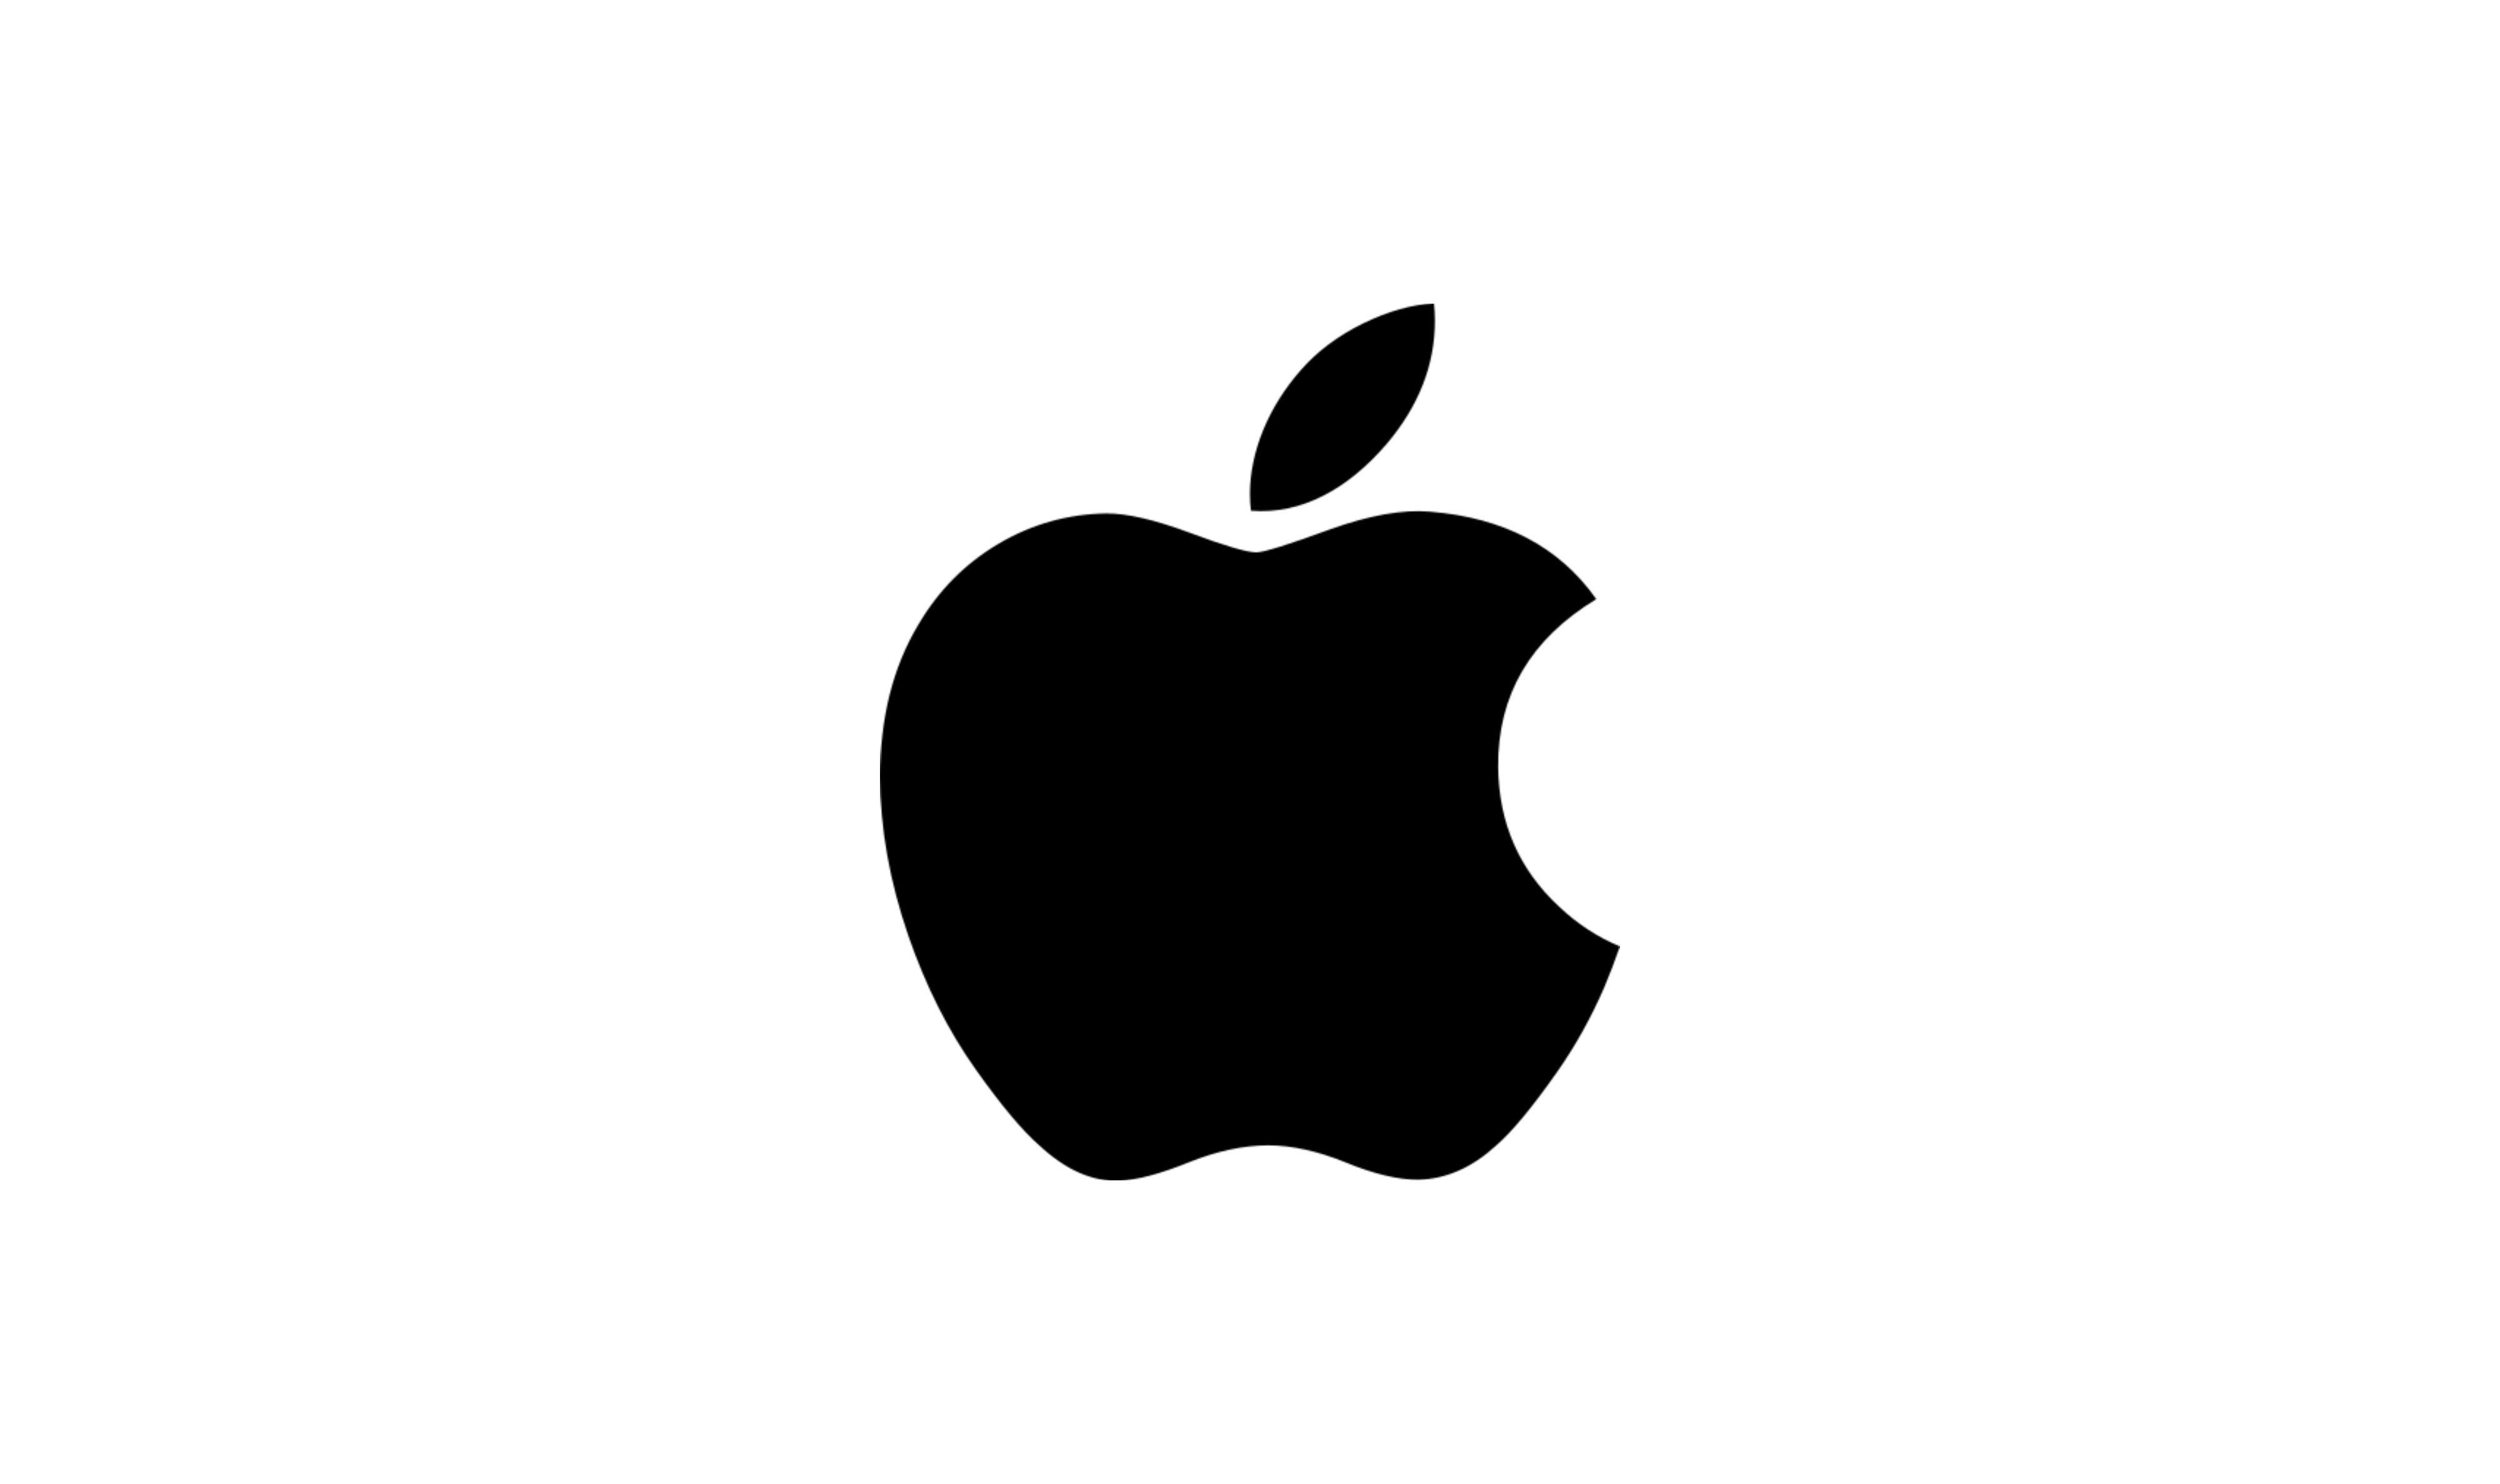 Apple Logo Featured